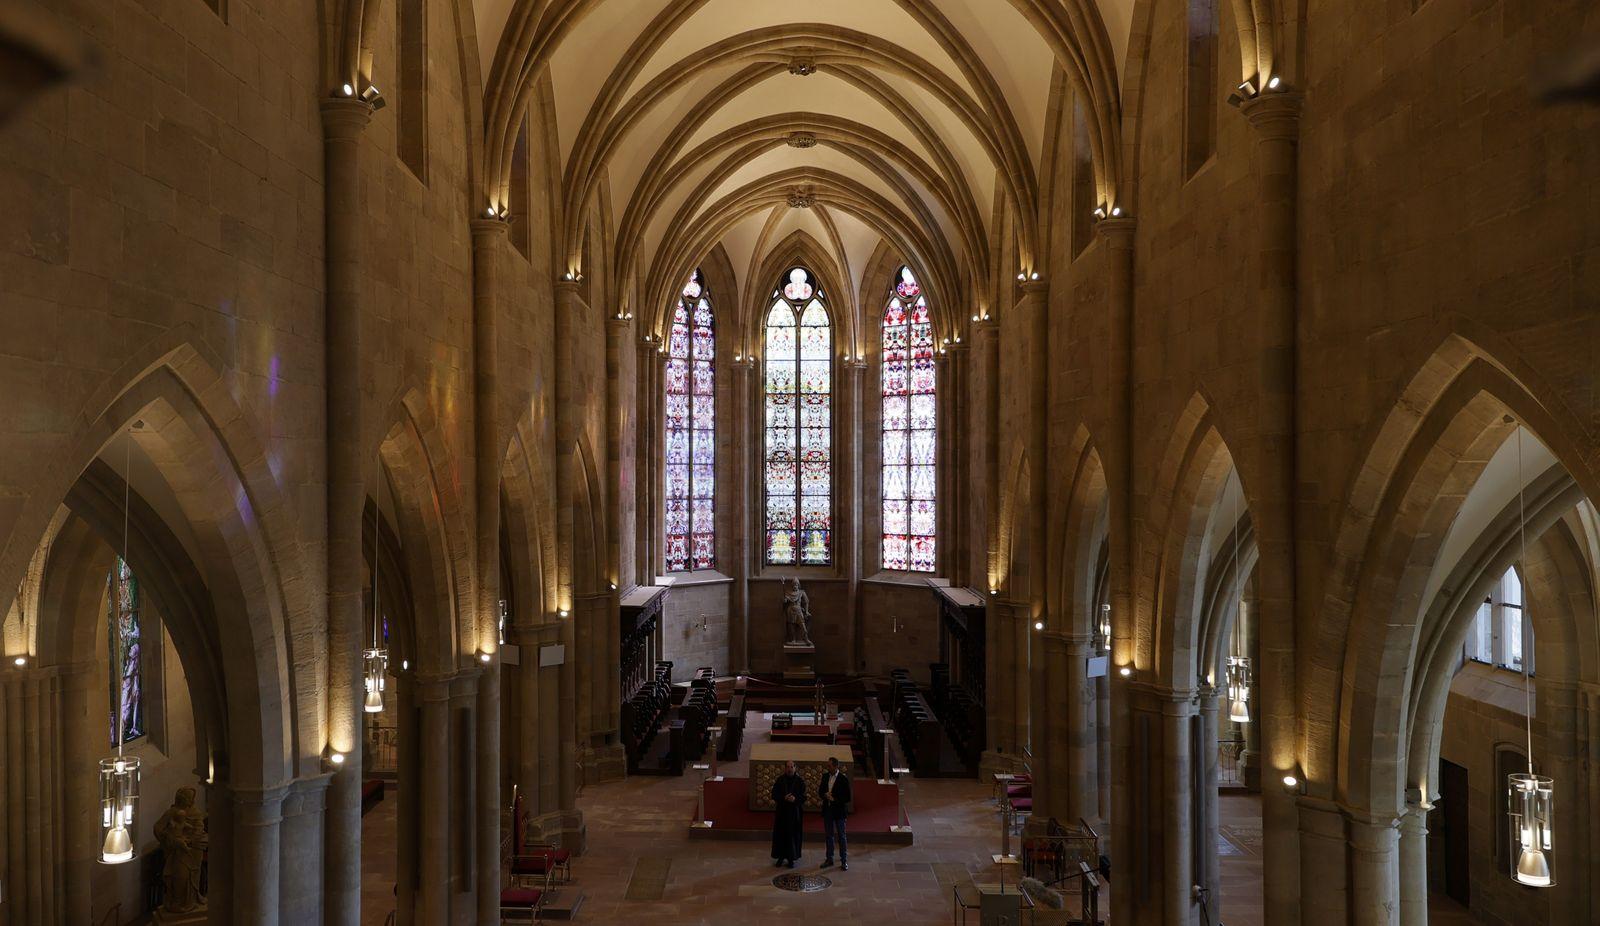 Windows by Gerhard Richter presented in Benedictine monastery in Tholey, Germany - 17 Sep 2020